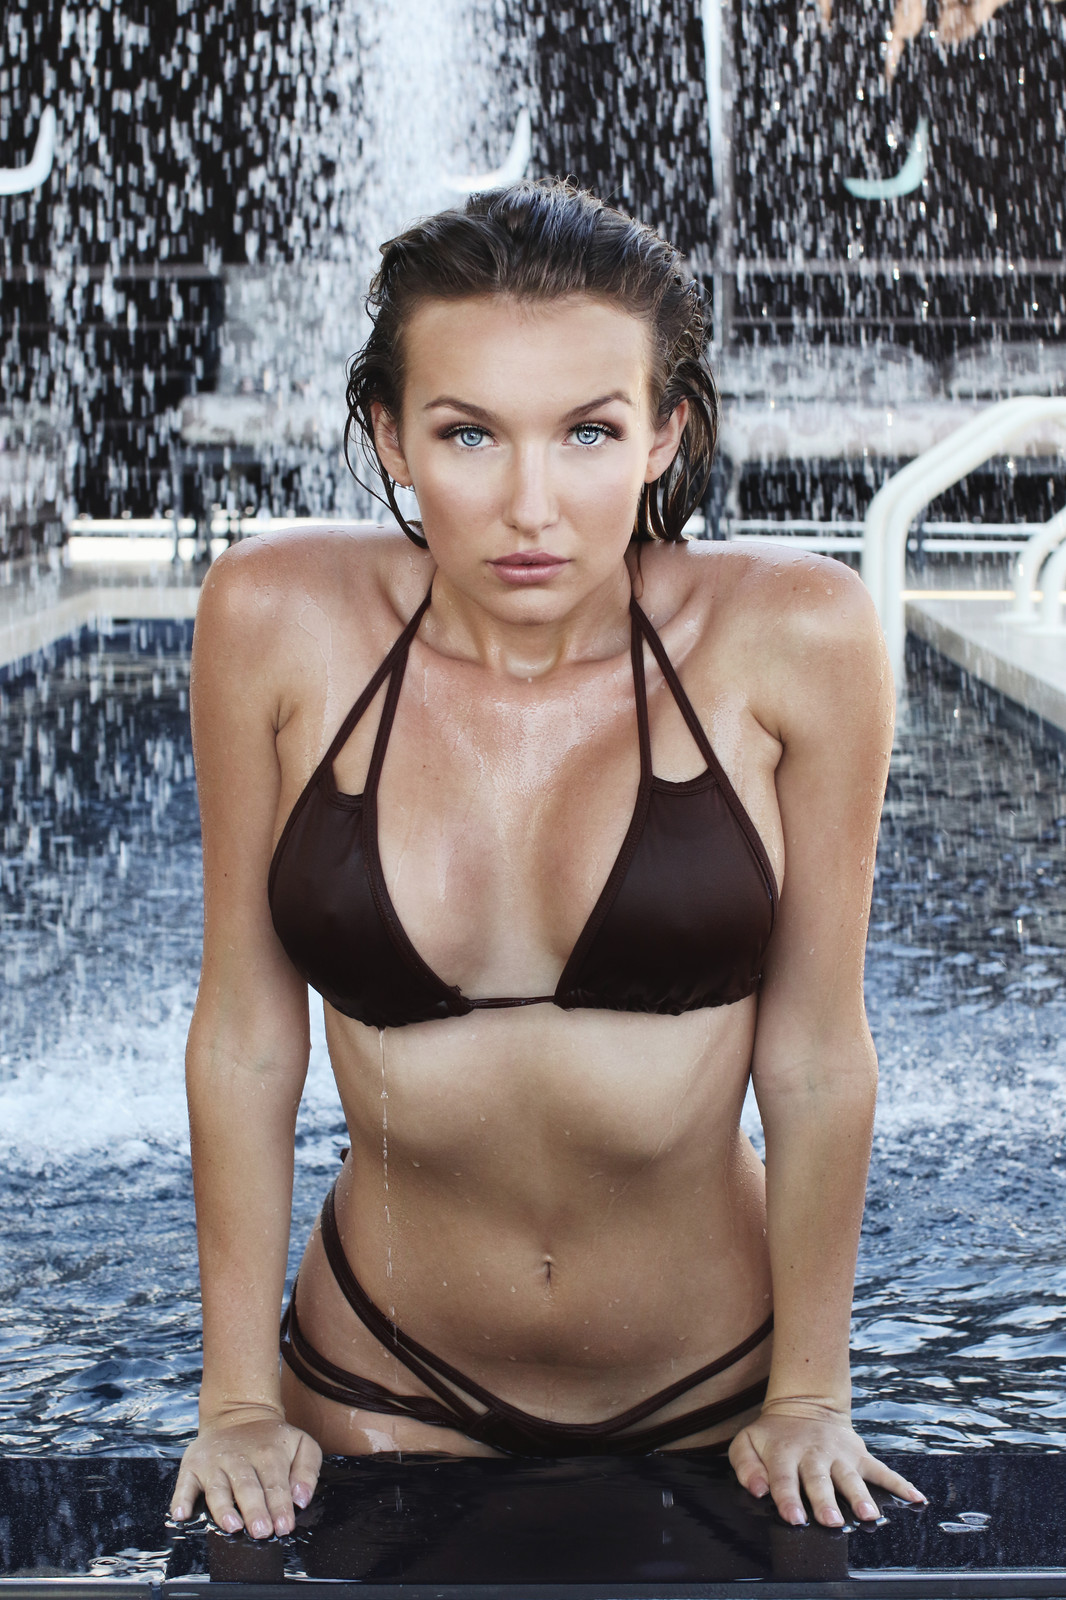 Paparazzi Chantel Zales nudes (17 foto and video), Sexy, Hot, Feet, swimsuit 2006